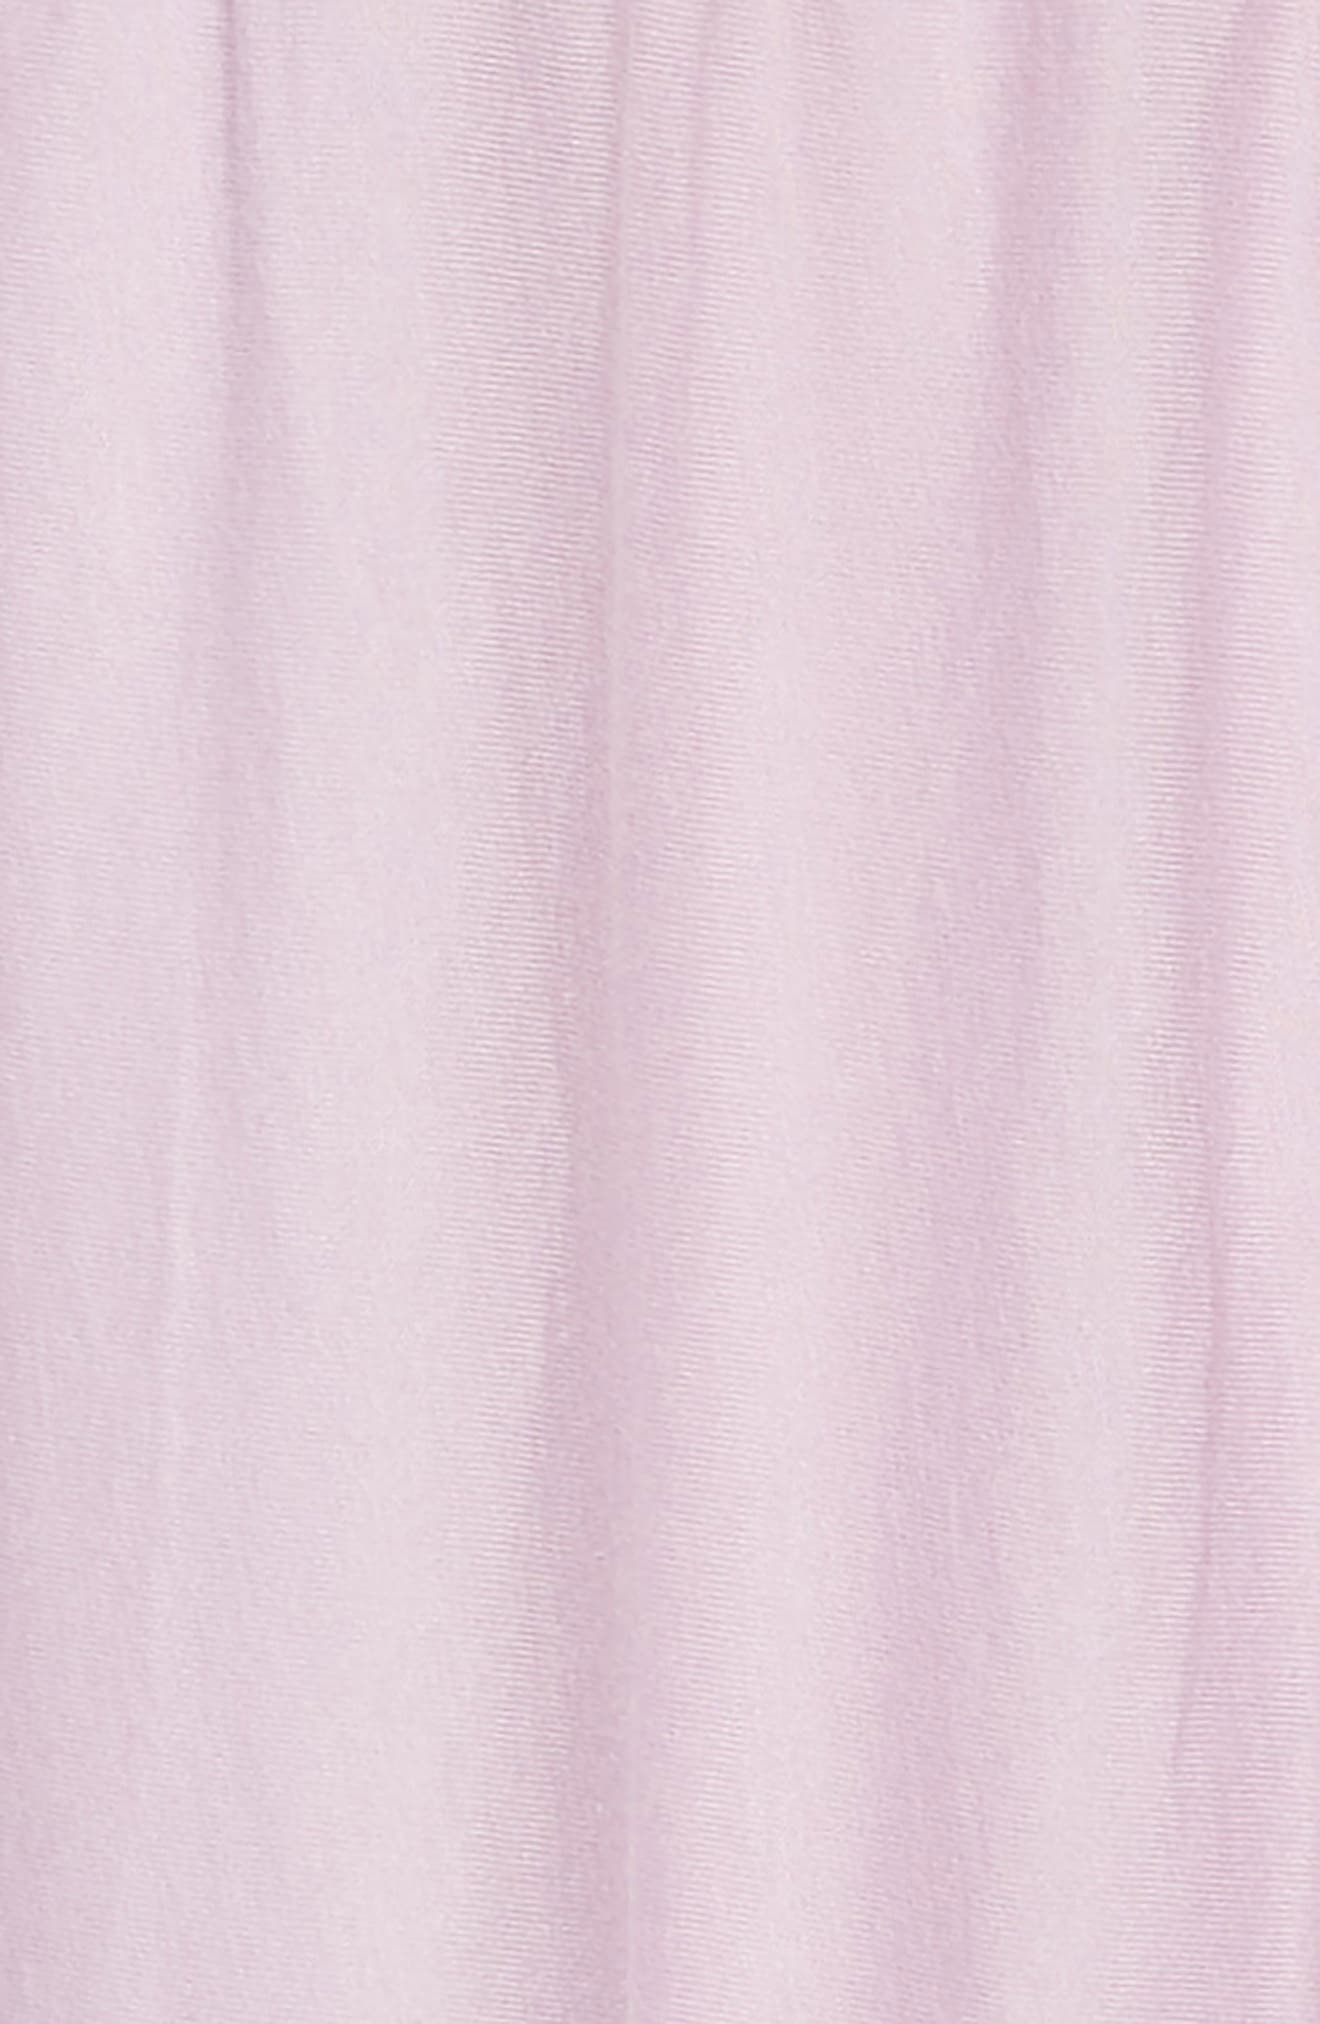 Flutter Sleeve Dress,                             Alternate thumbnail 3, color,                             SMOKY WISTERIA